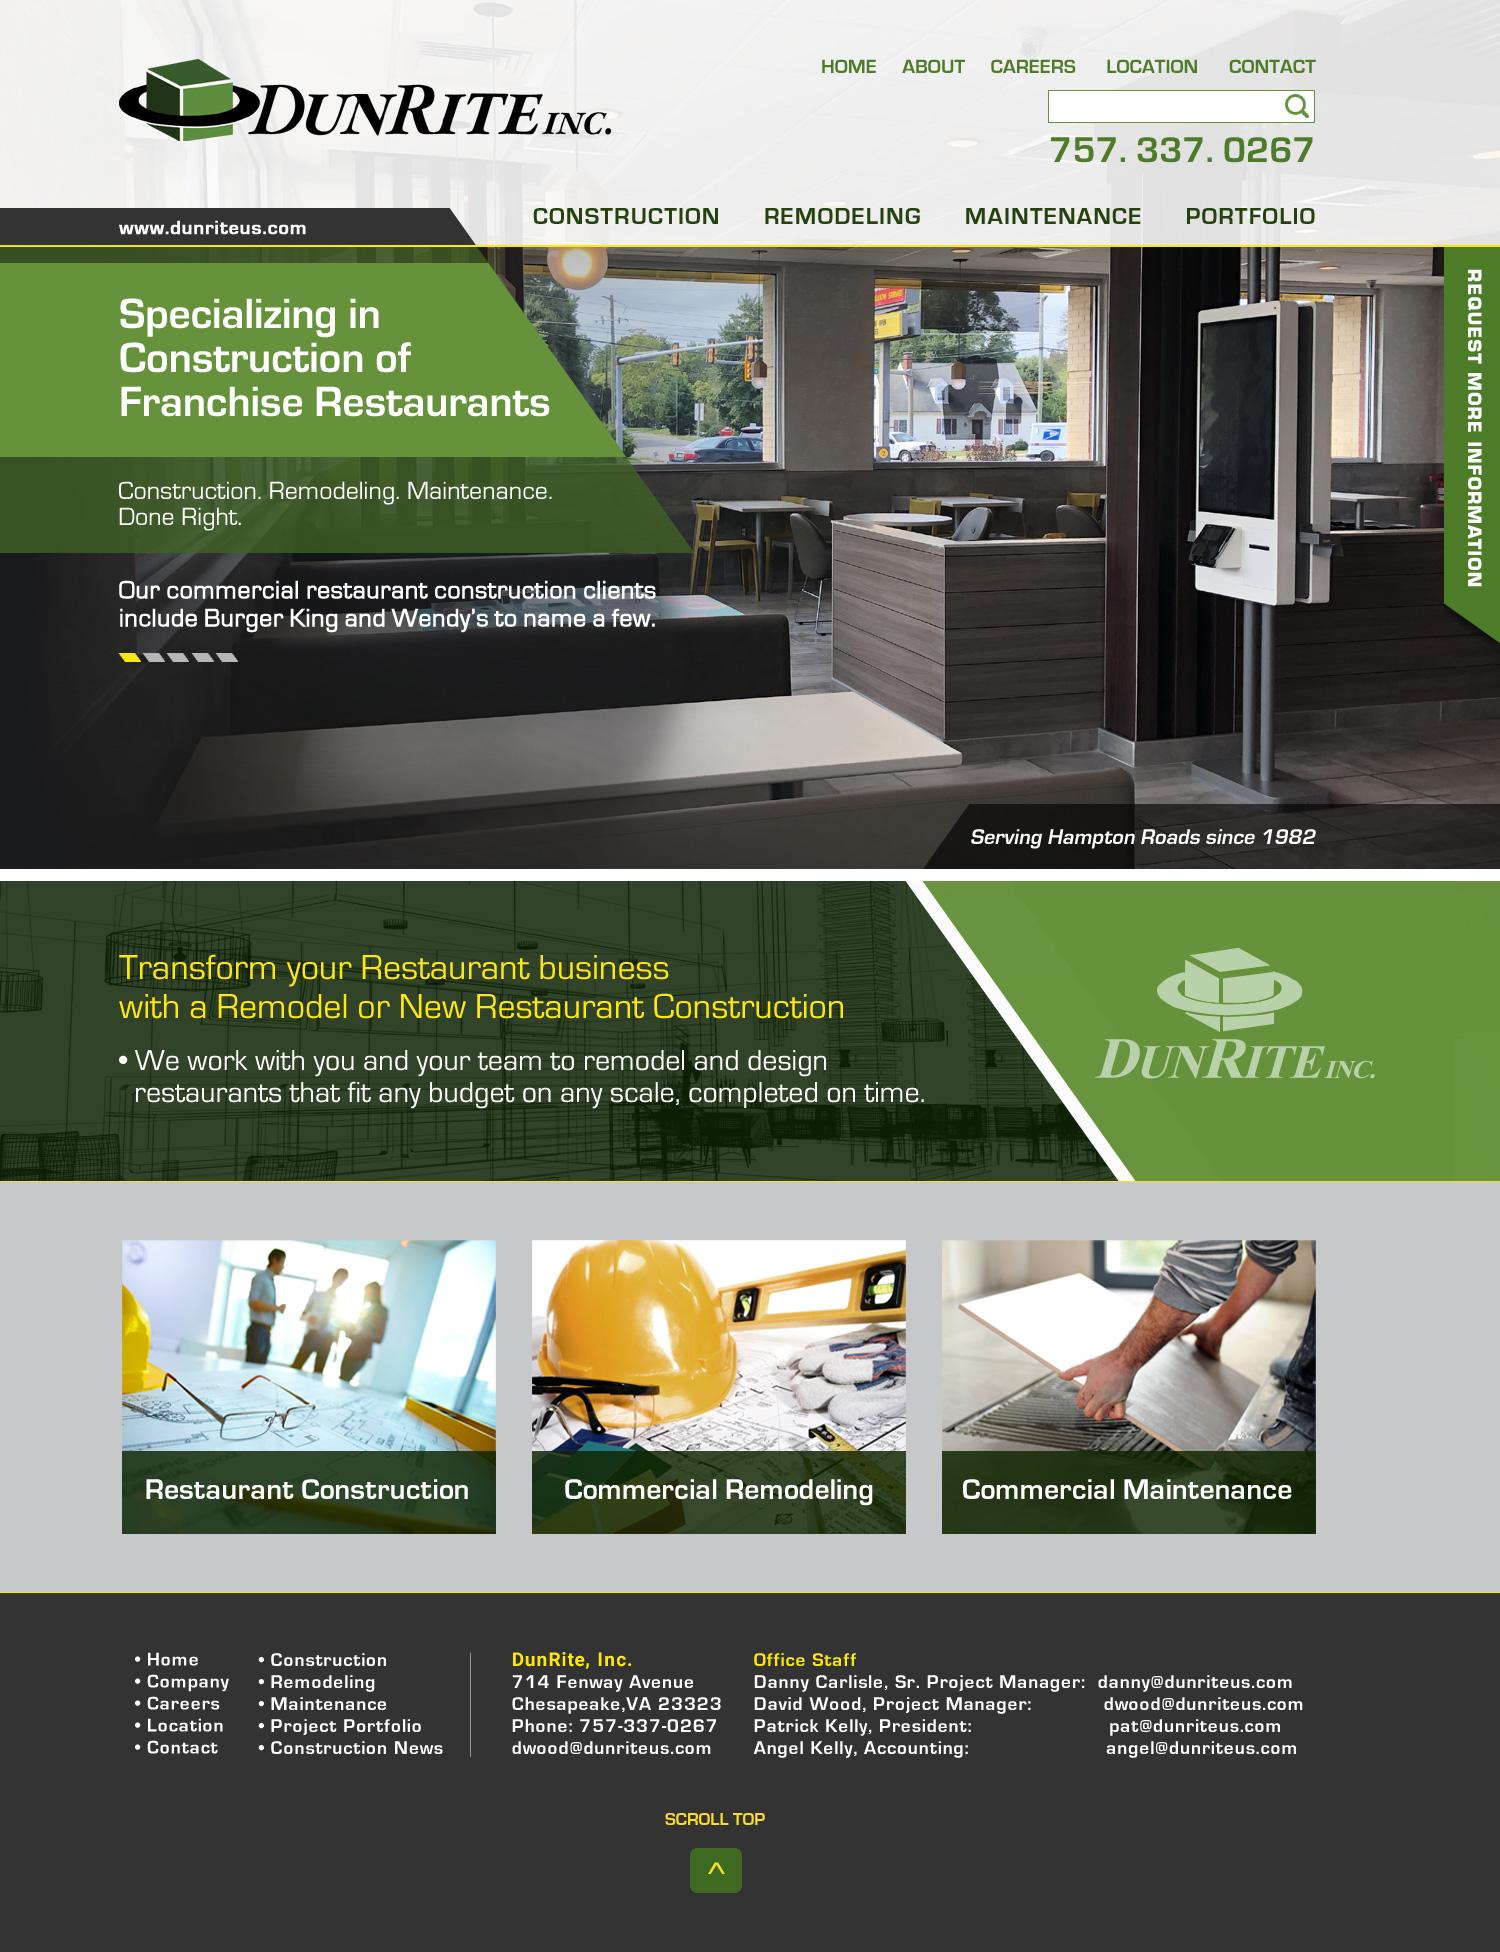 Professional web design building contractors, Web design